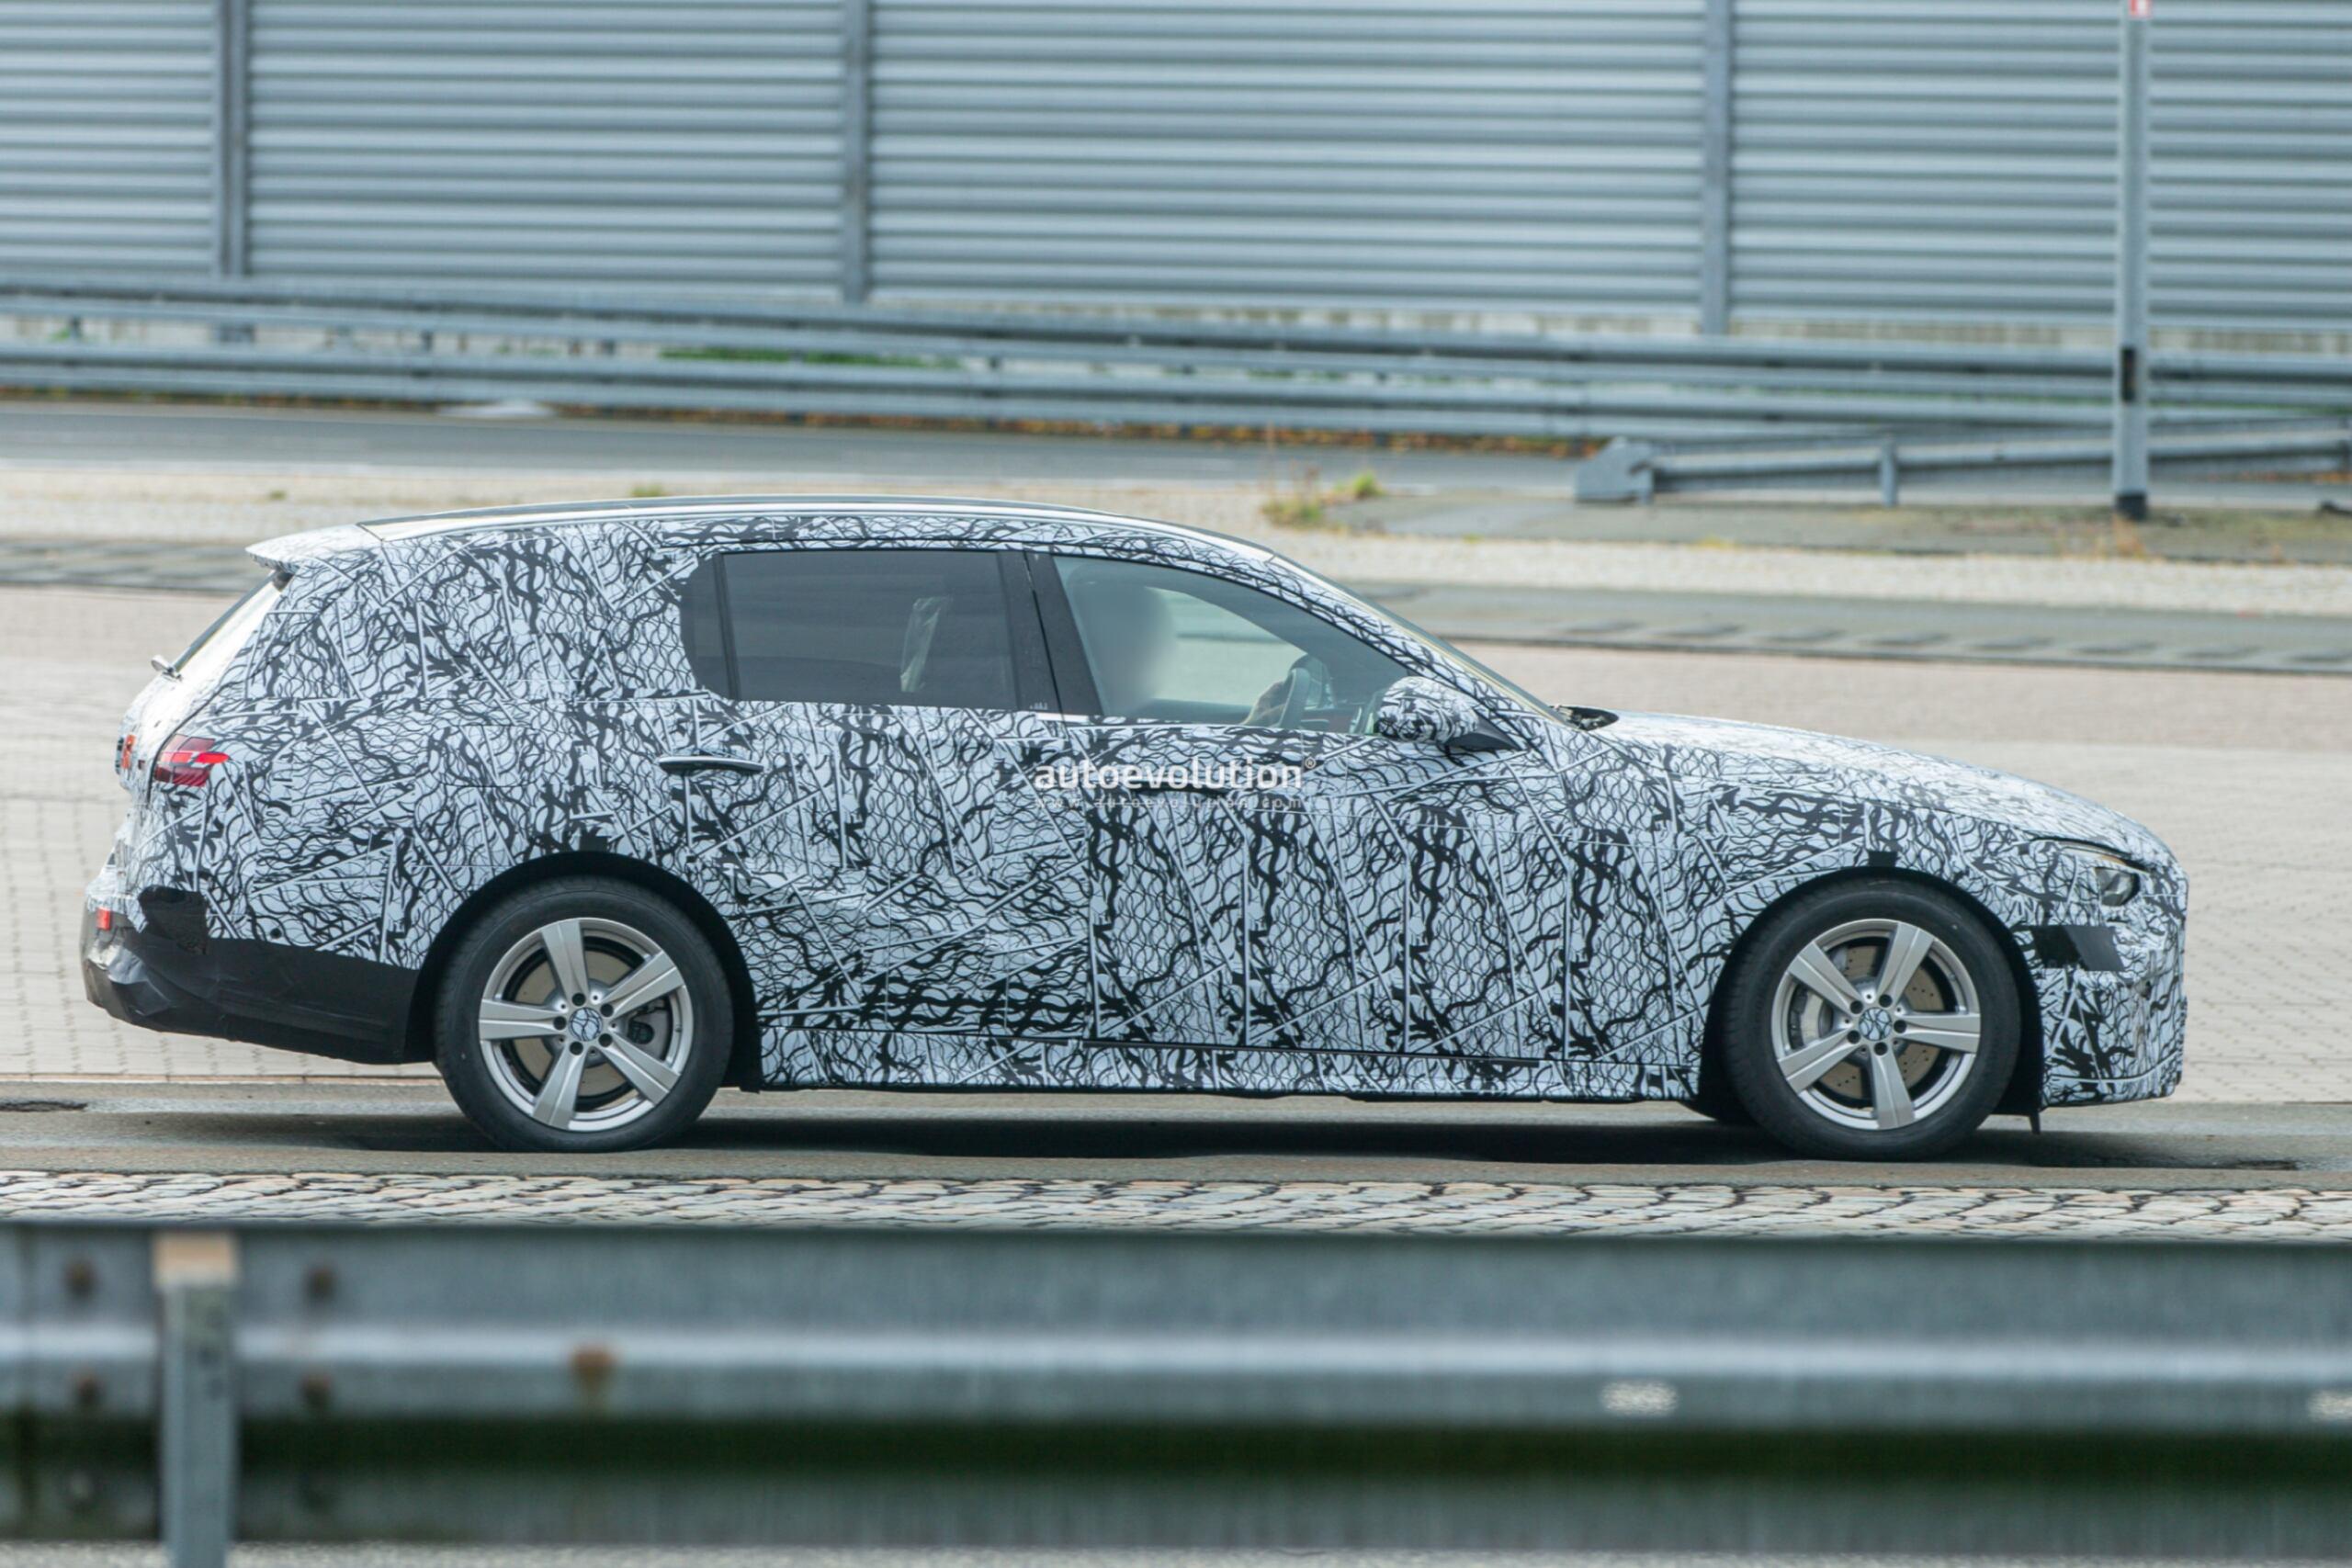 Mercedes Classe C Wagon 2022 foto spia